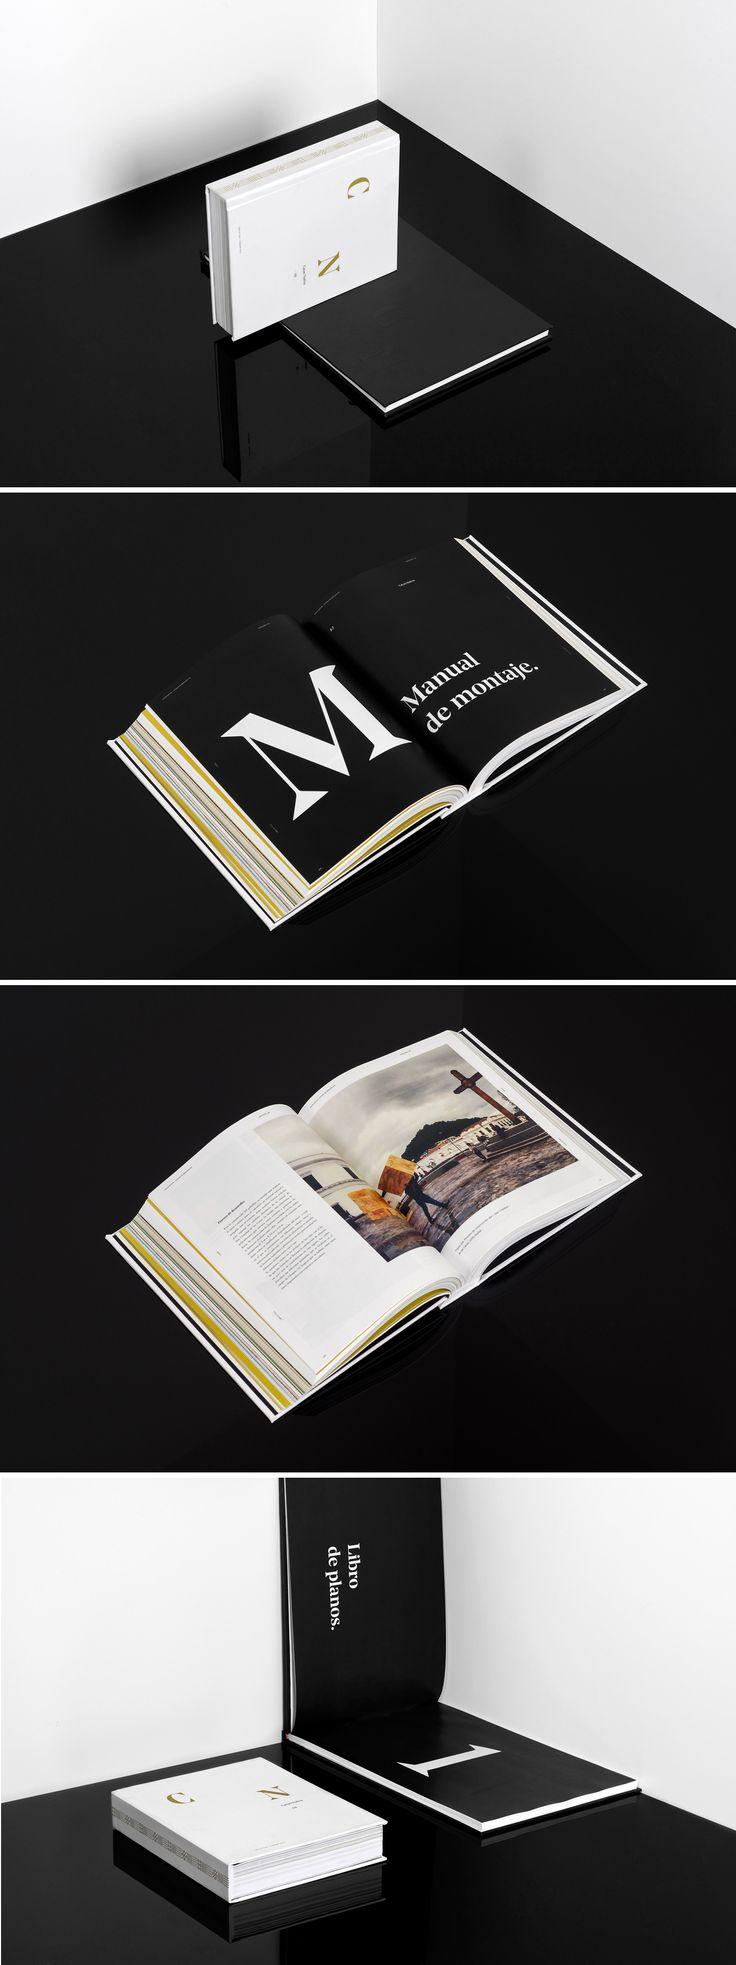 Cacao Nativa Book / Studio XL